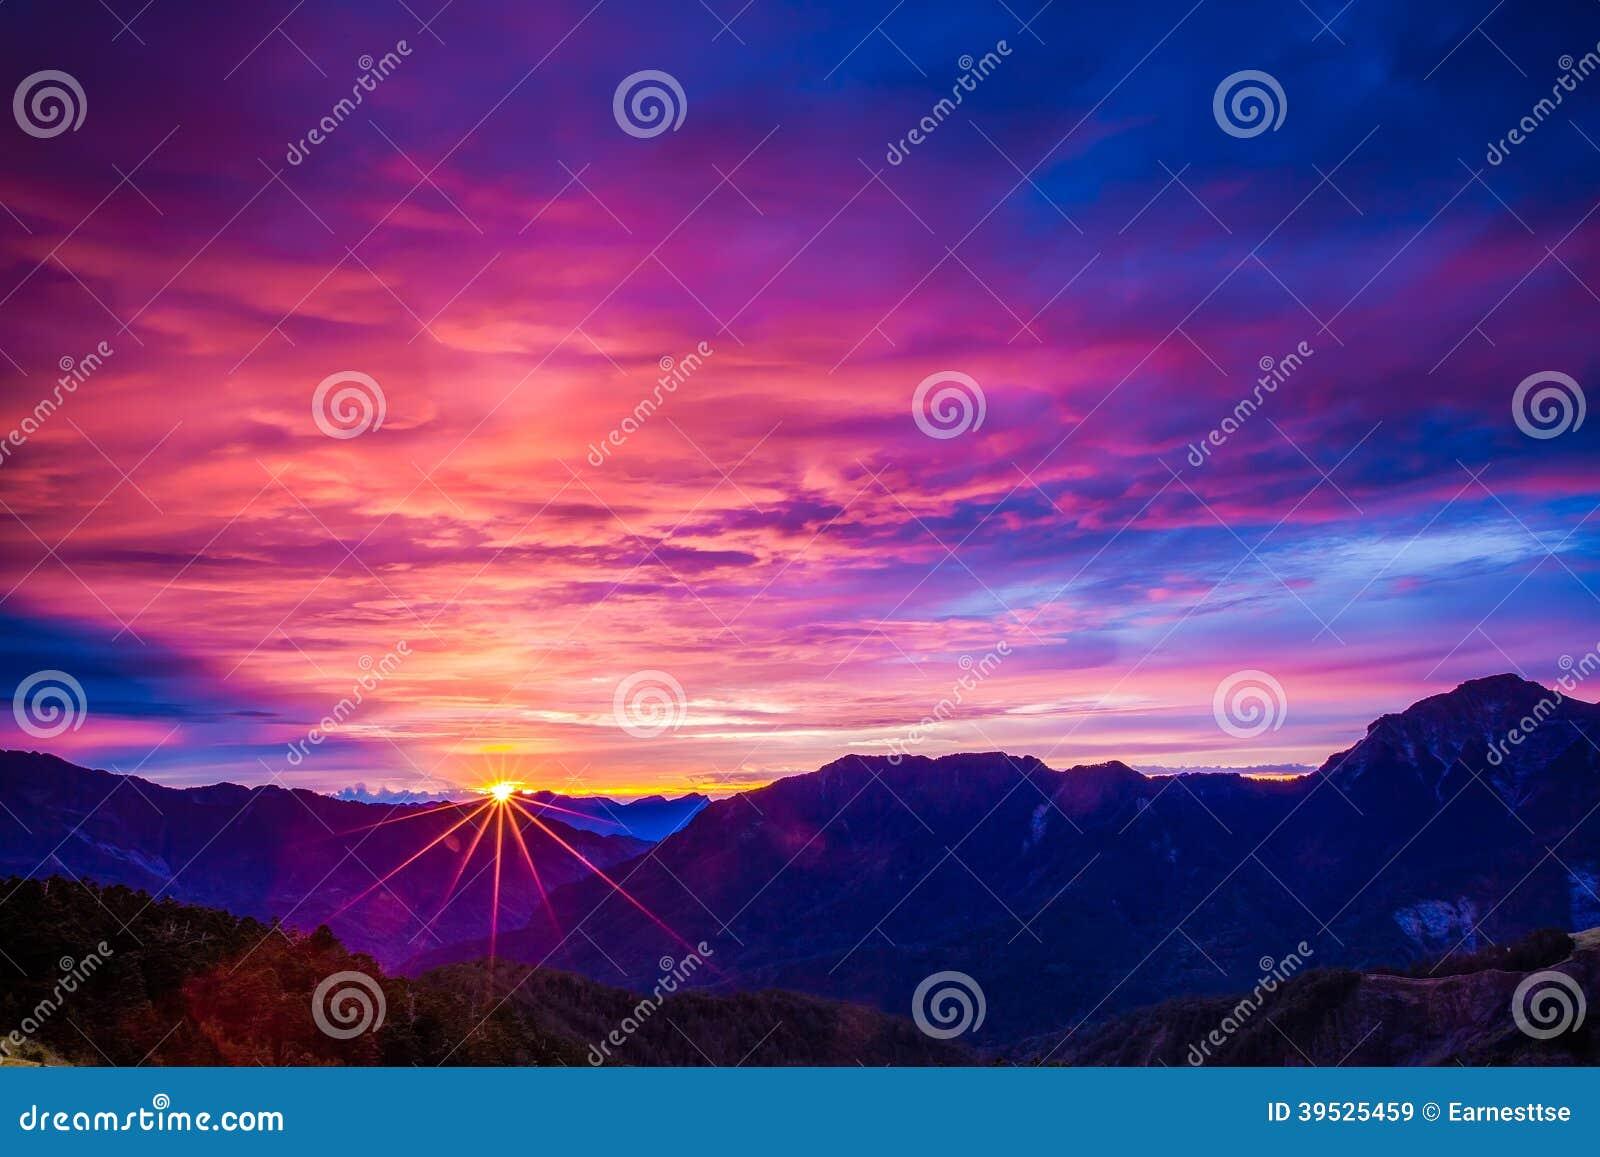 Download Sunset mountain landscape stock image. Image of sunlight - 39525459